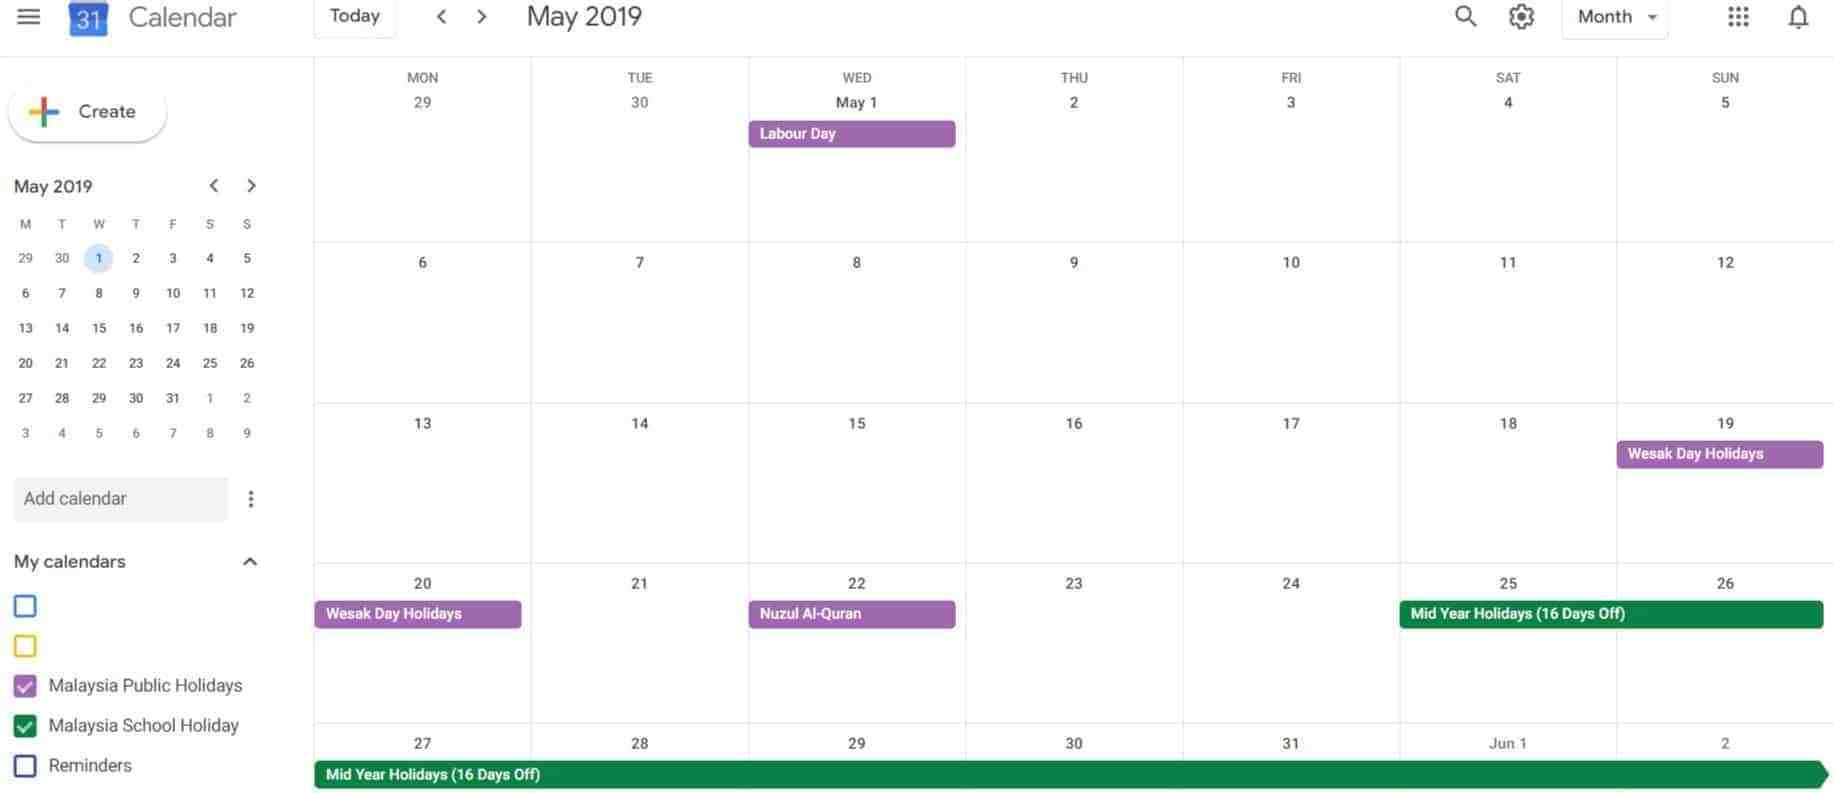 Bangla Calendar 2019 Pdf  Google Search pertaining to Uc Berkeley Calendar 2020-2020